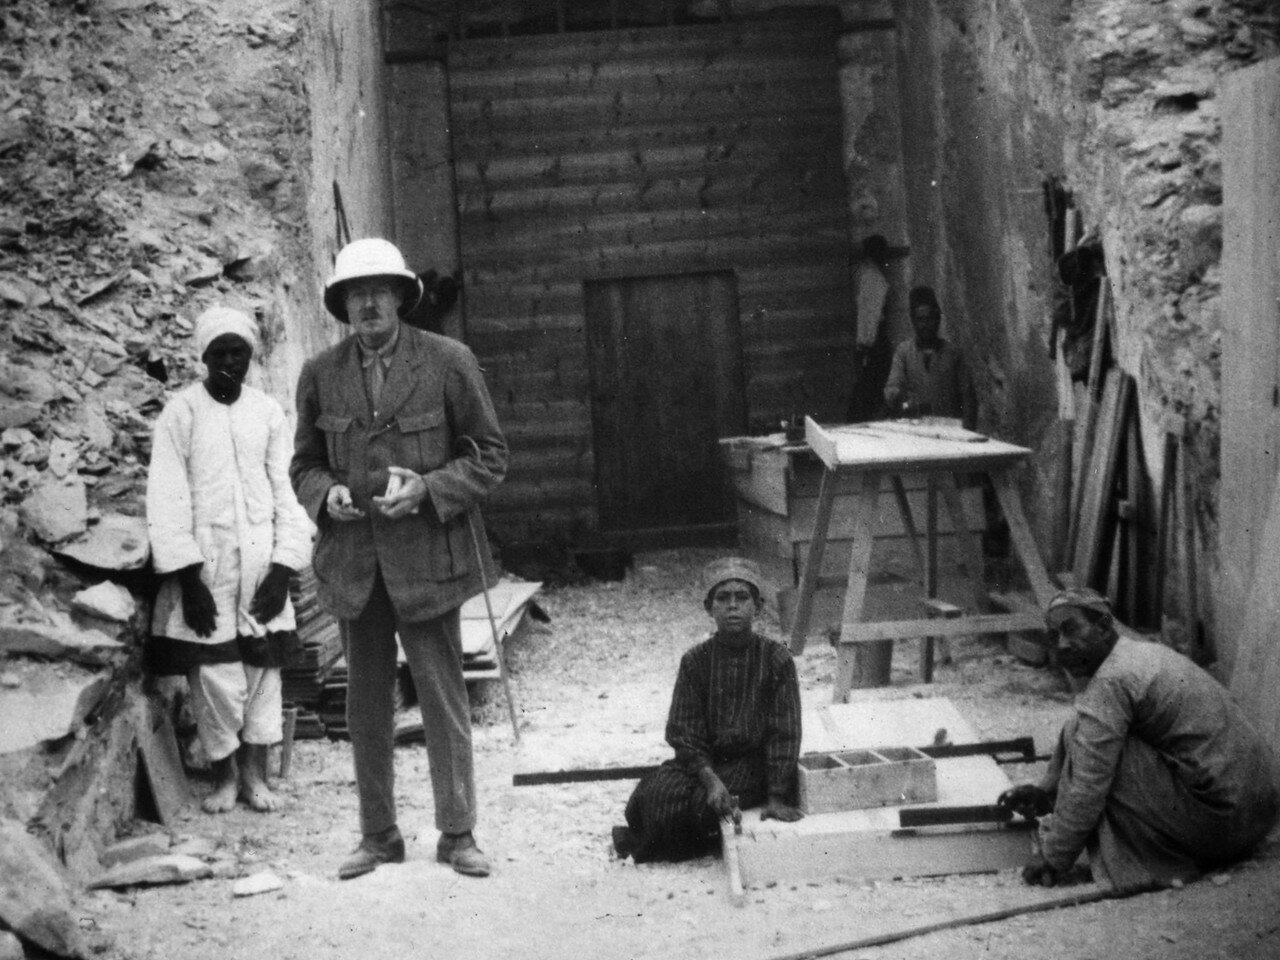 Каллендер, ассистент Говарда Картера у входа в гробницу